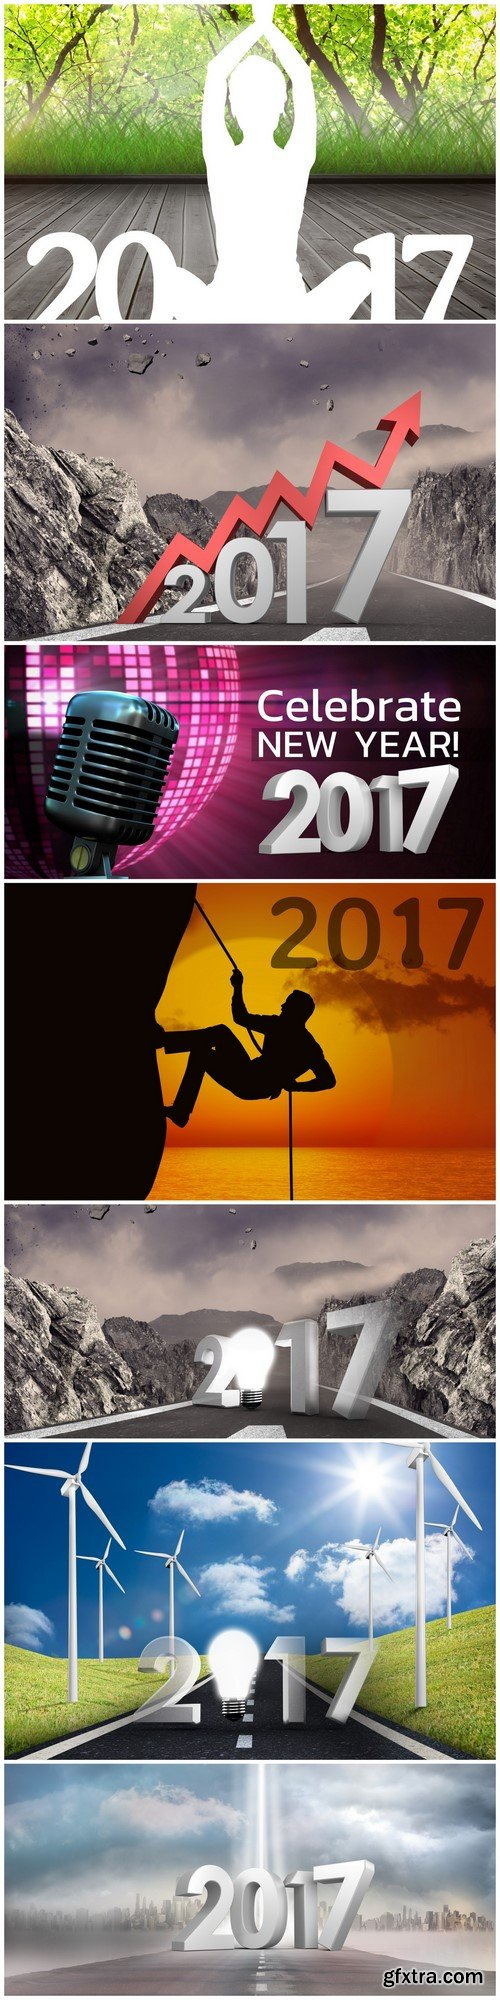 Illustrations of 2017 7X JPEG